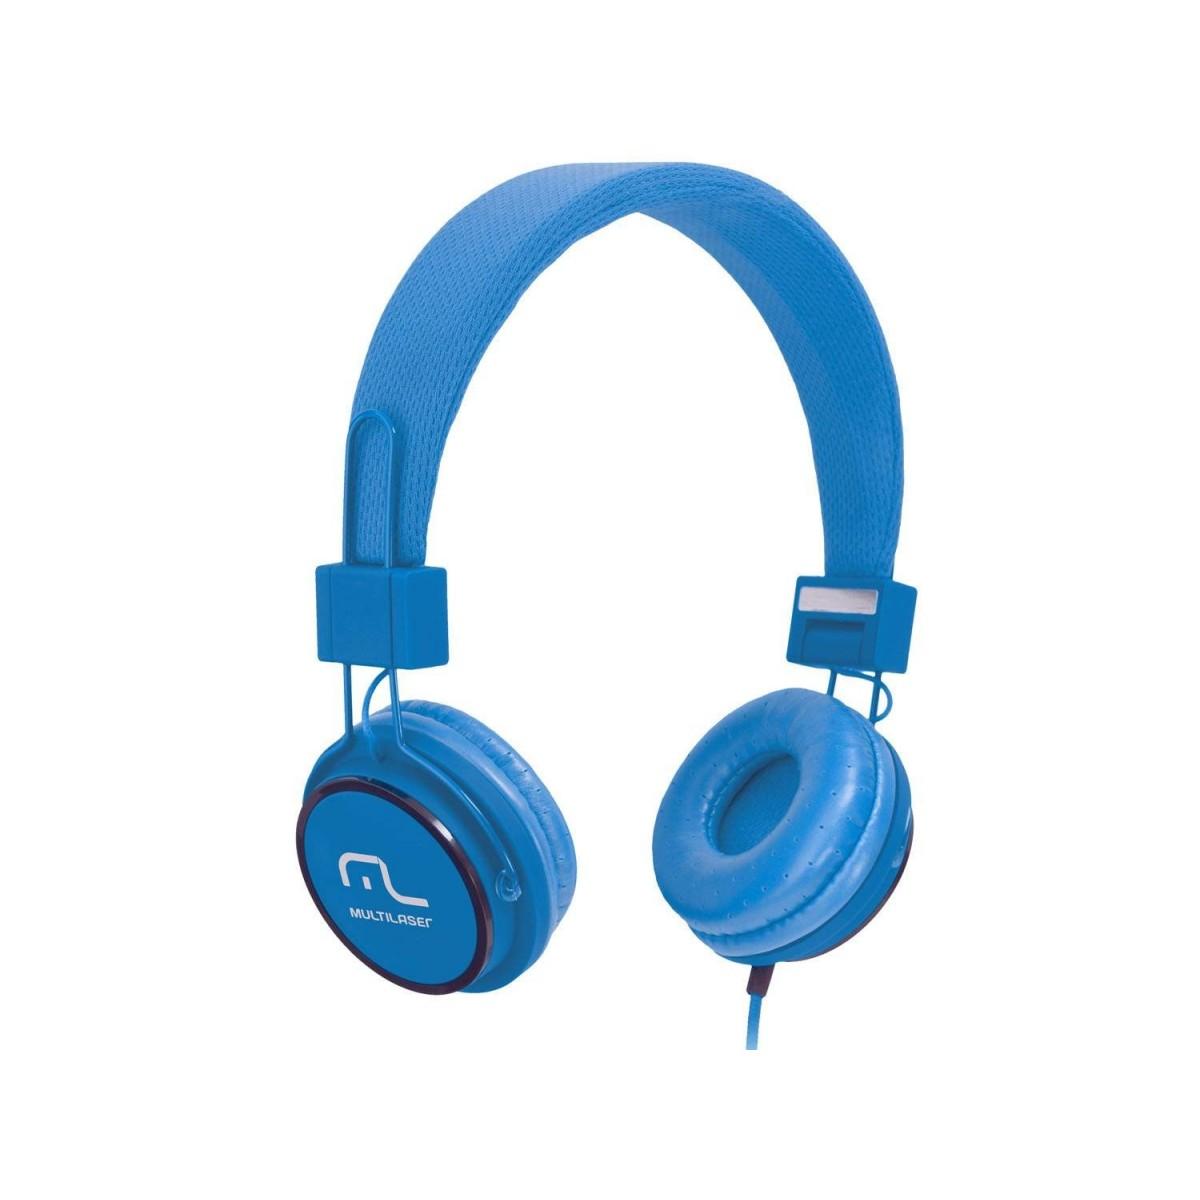 Fone HeadFun - Microfone para Celular Azul PH089 - Multilaser